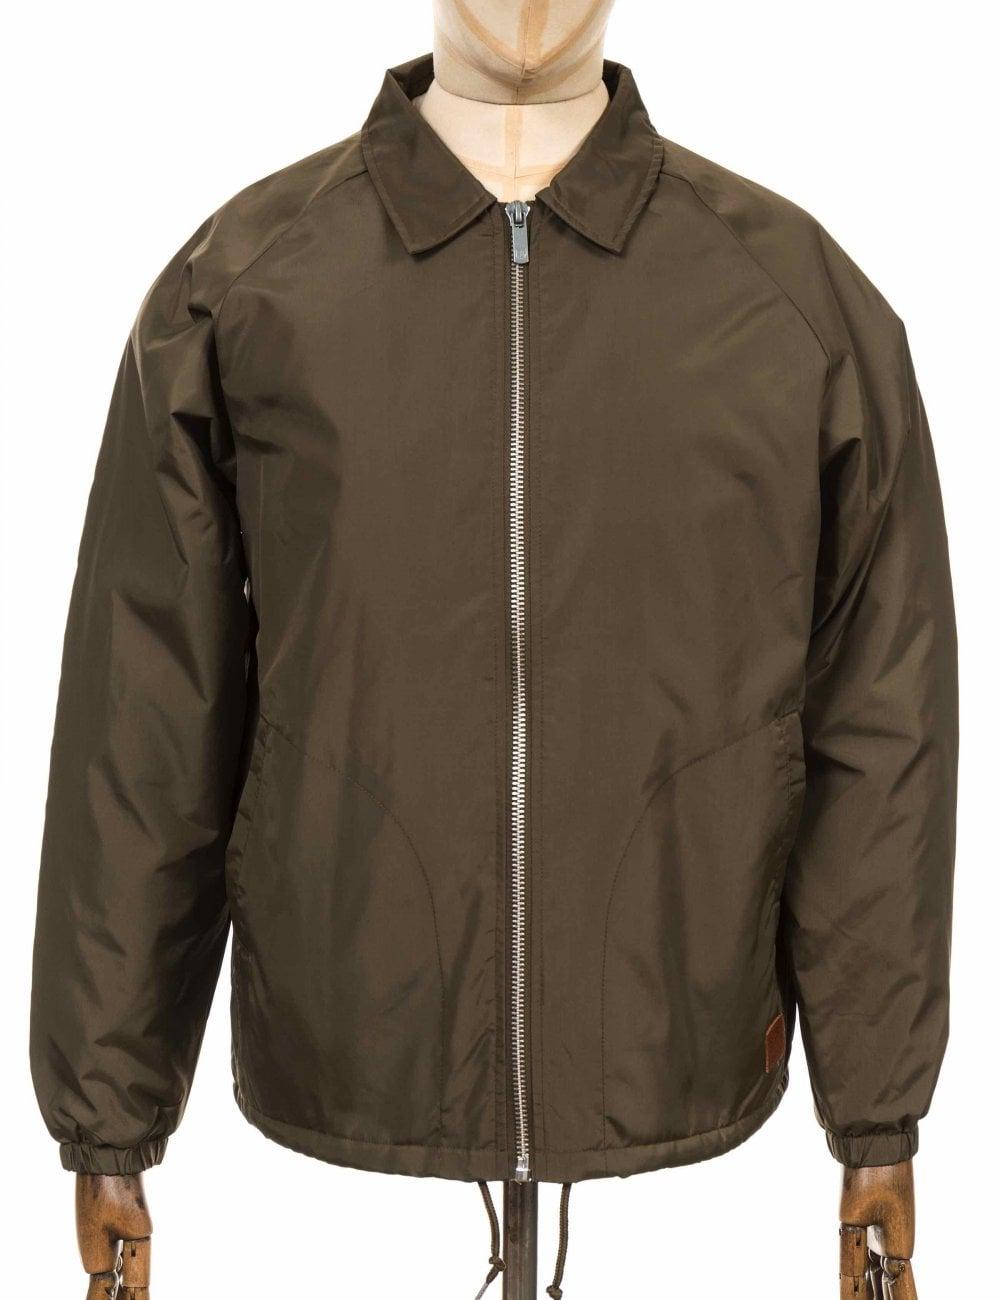 Brixton Claxton Sherpa Jacket - Olive - Clothing from Fat Buddha Store UK 12299dd0f1f